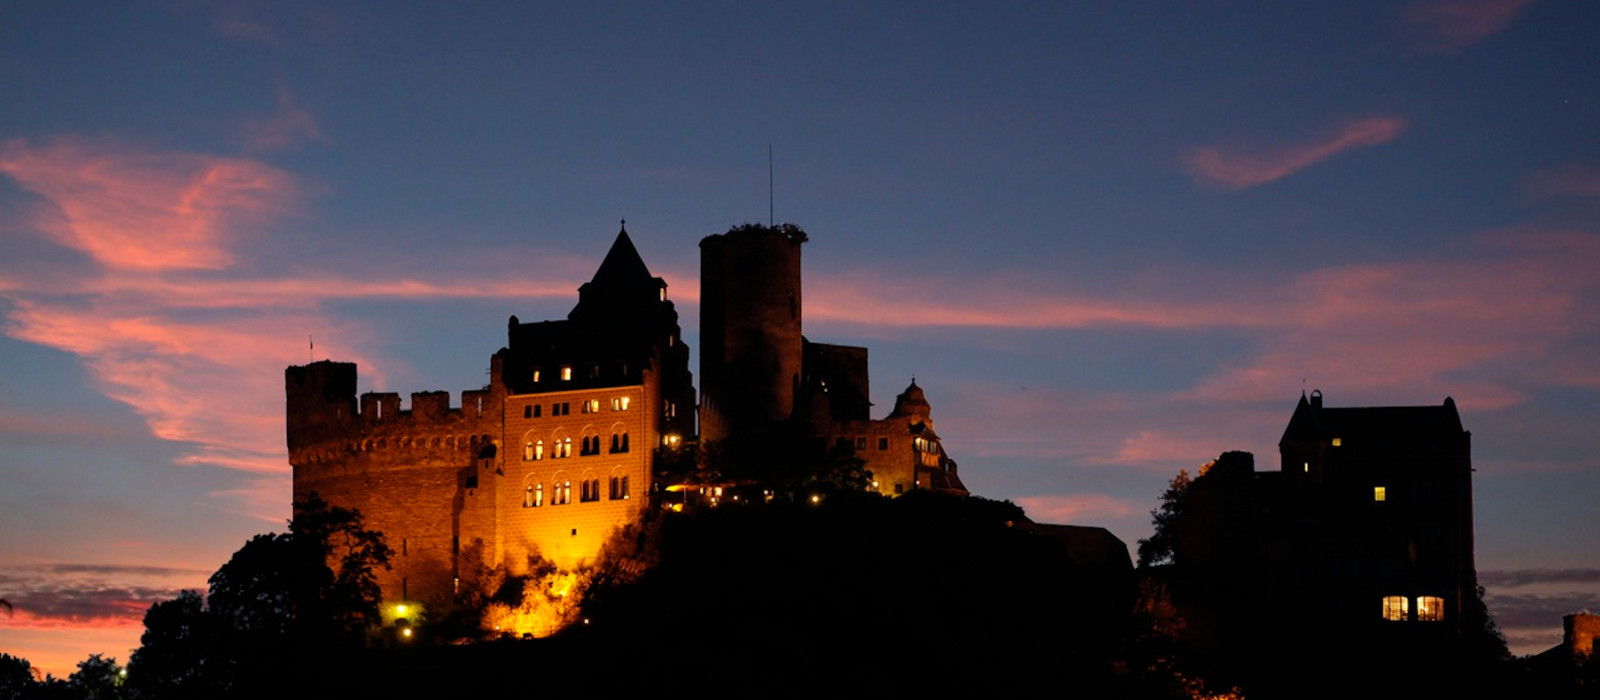 Hotel Castle  Auf Schoenburg Germany